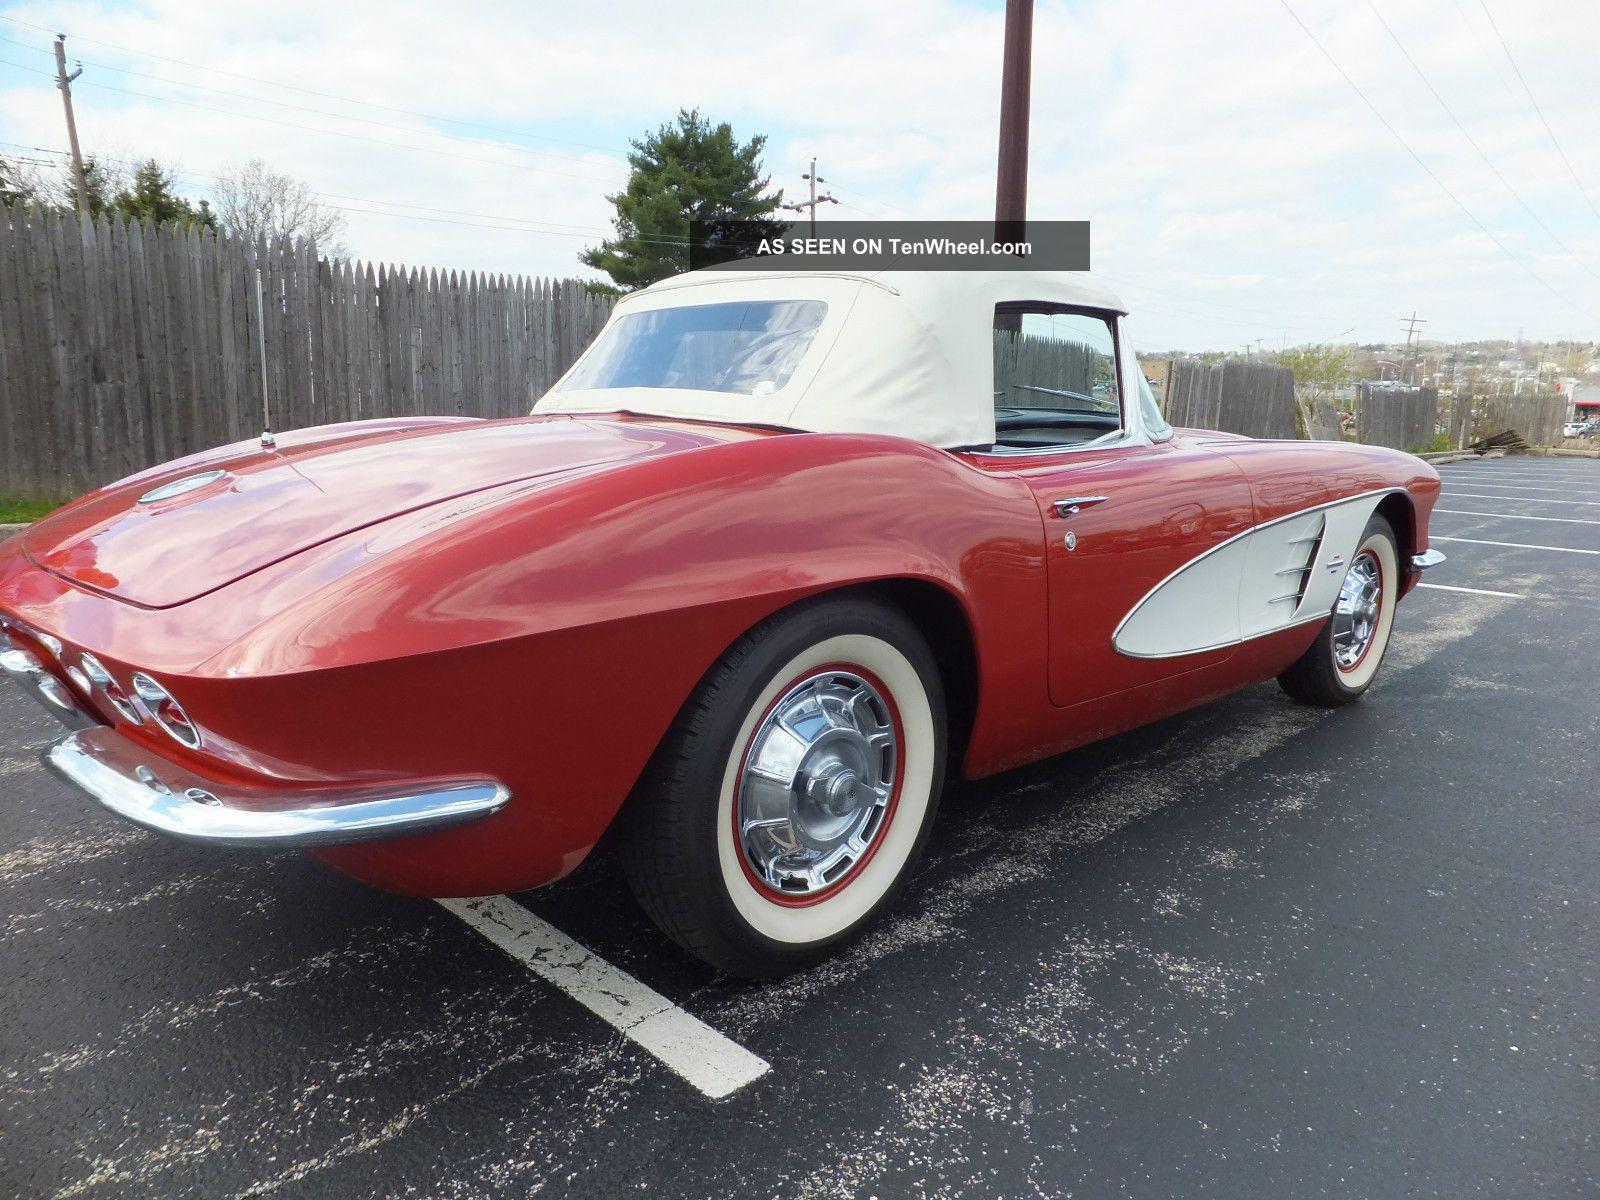 1961 Chevrolet Corvette Roadster Convertible Numbers